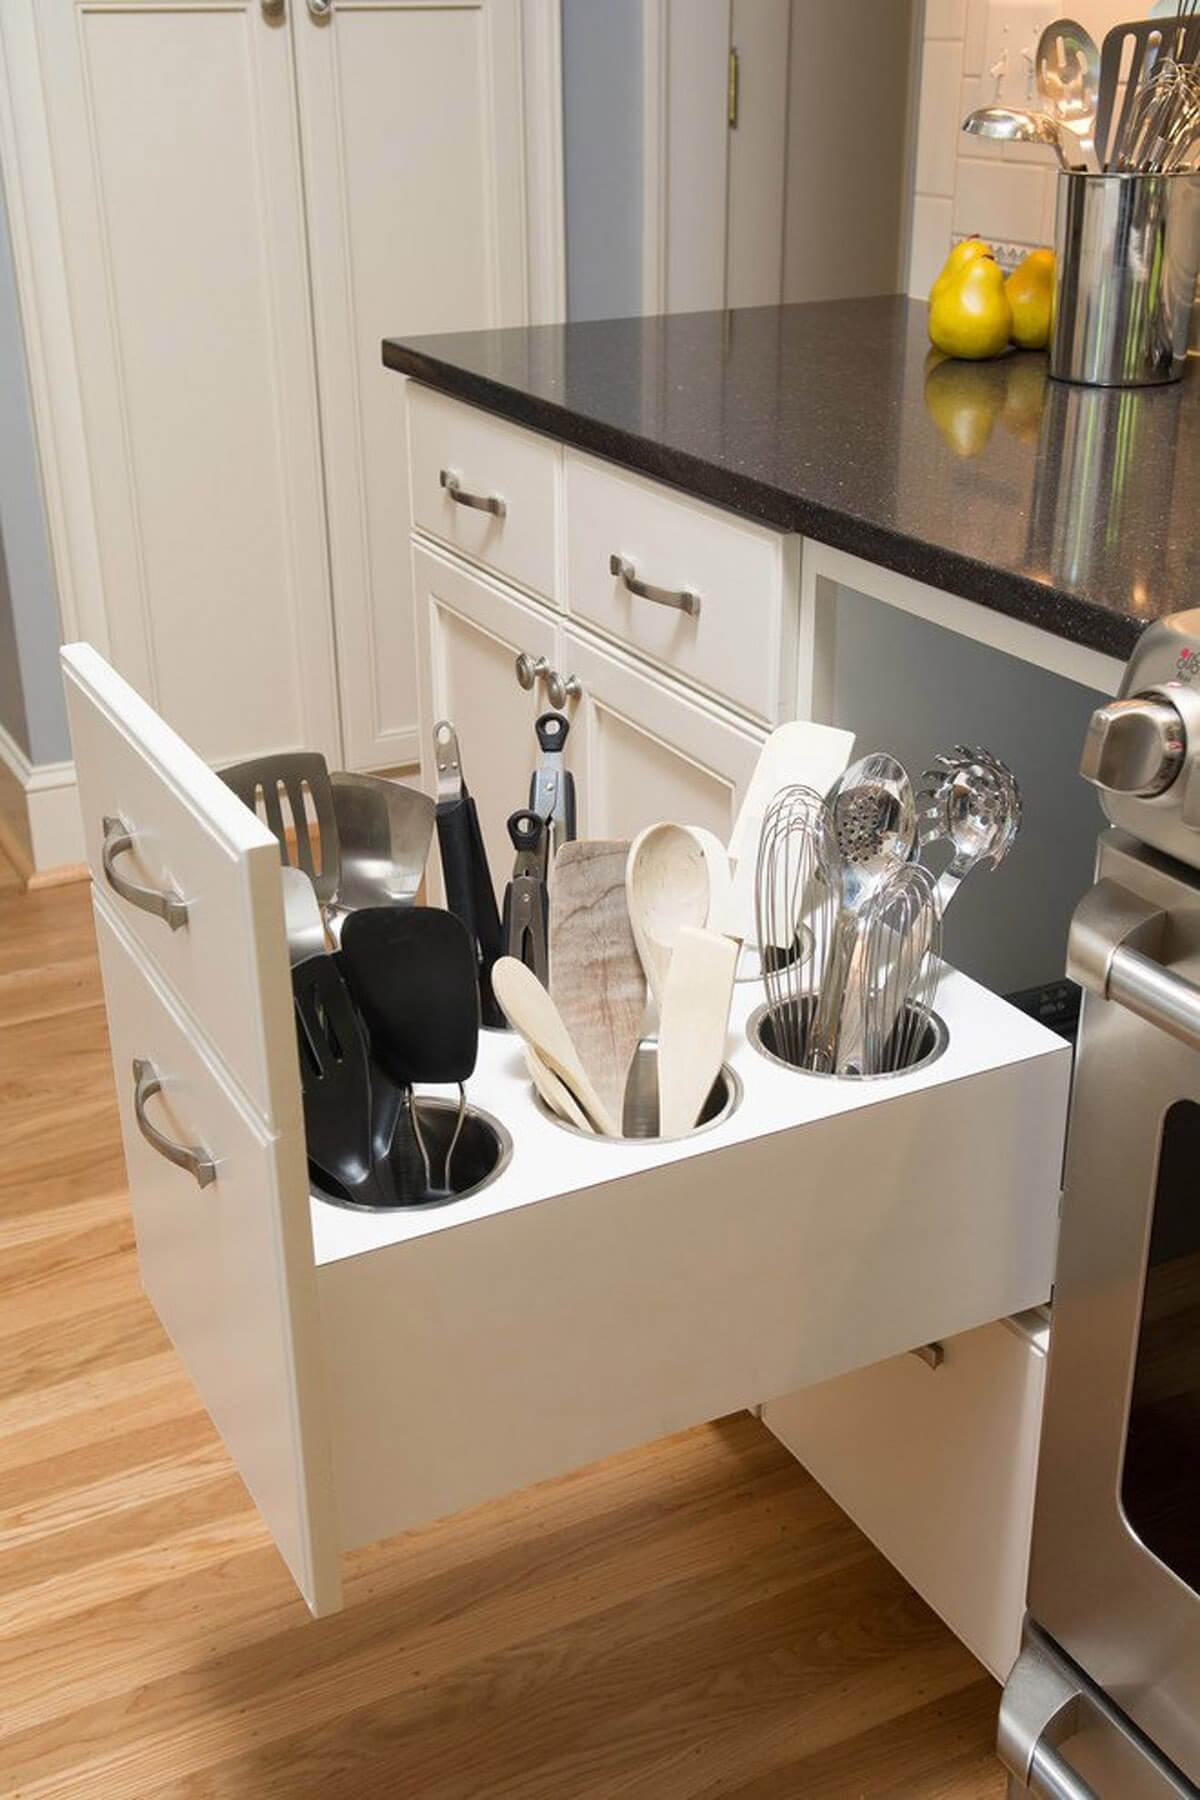 De-clutter Your Counter Space with Hidden Utensil Caddies